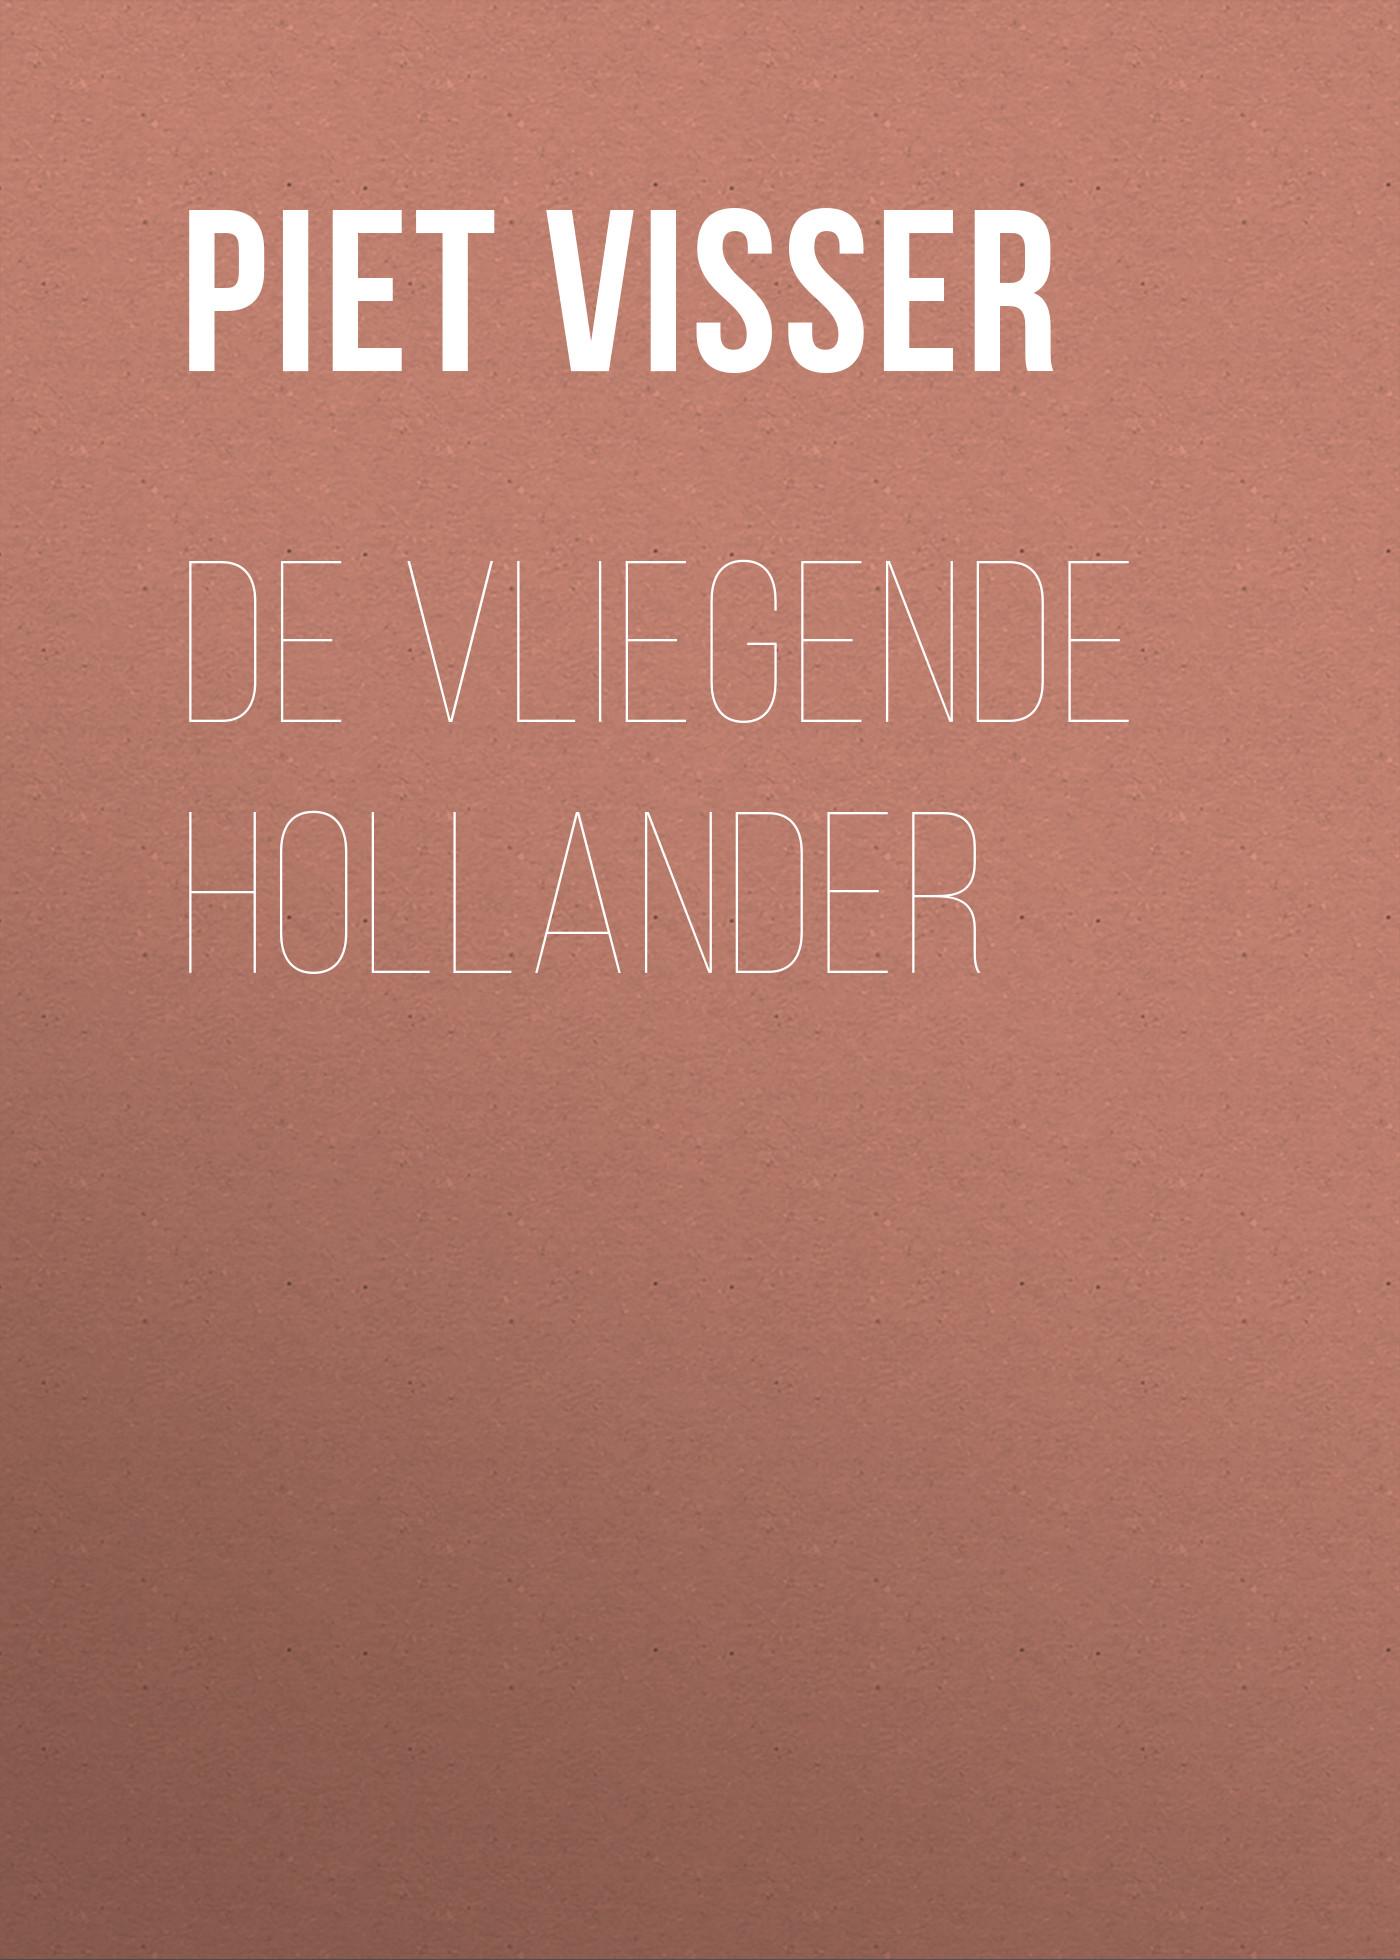 Piet Visser De vliegende Hollander